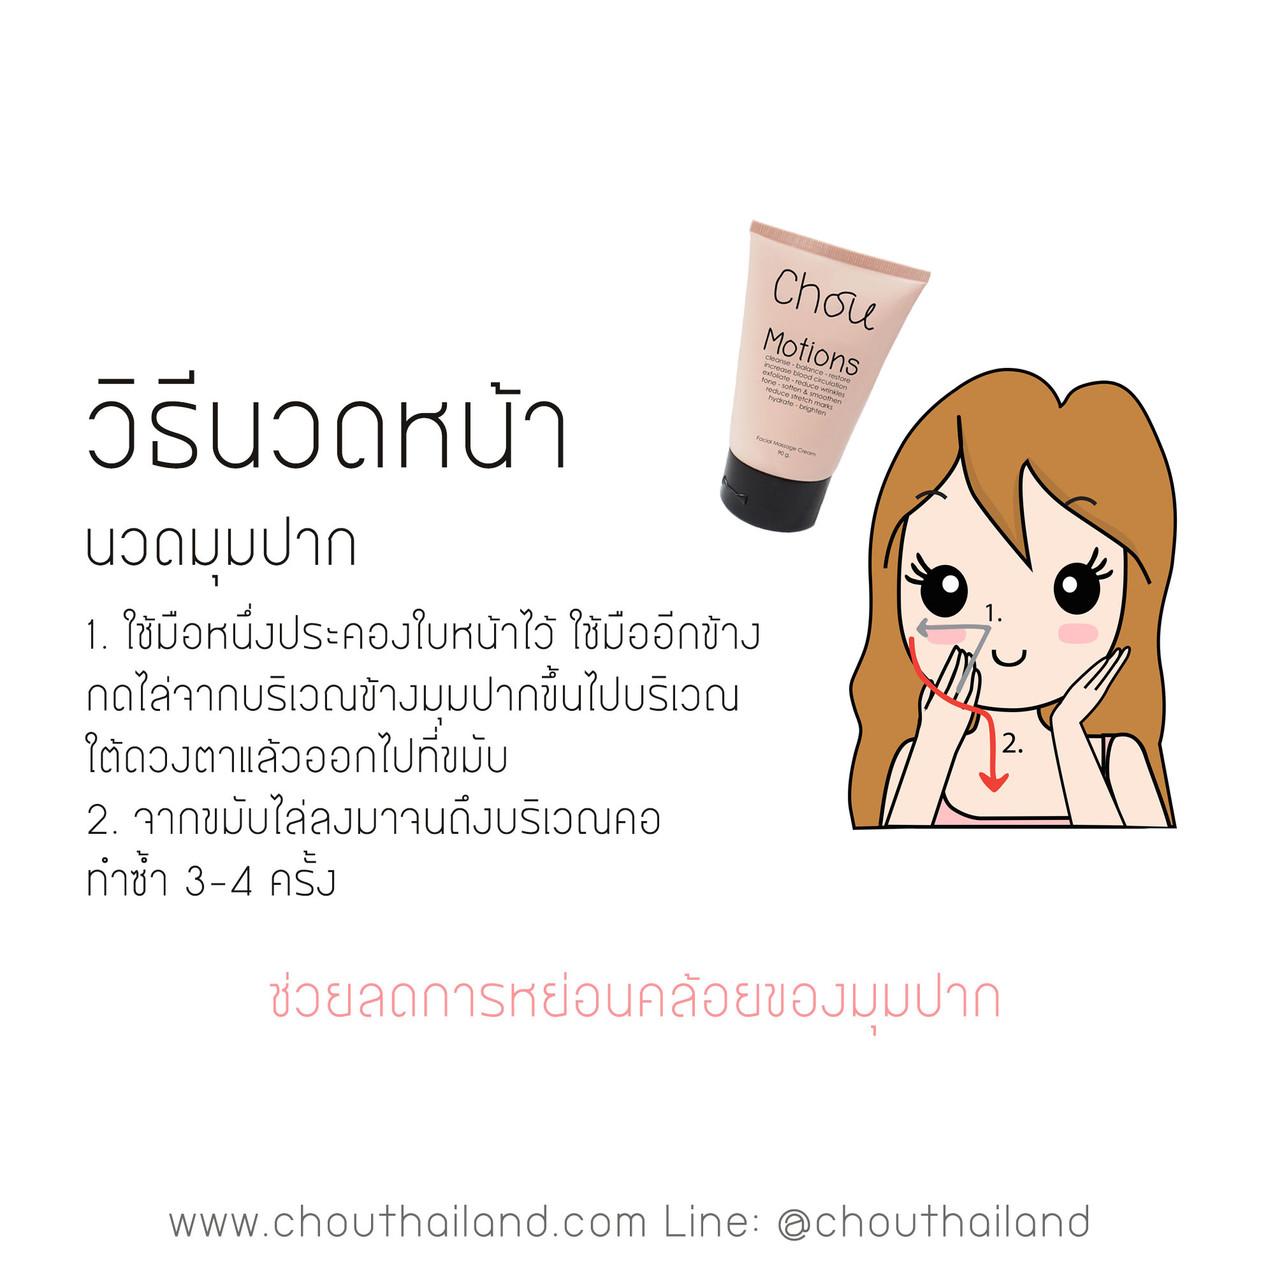 Motions Massage cream 7 Mouth massage